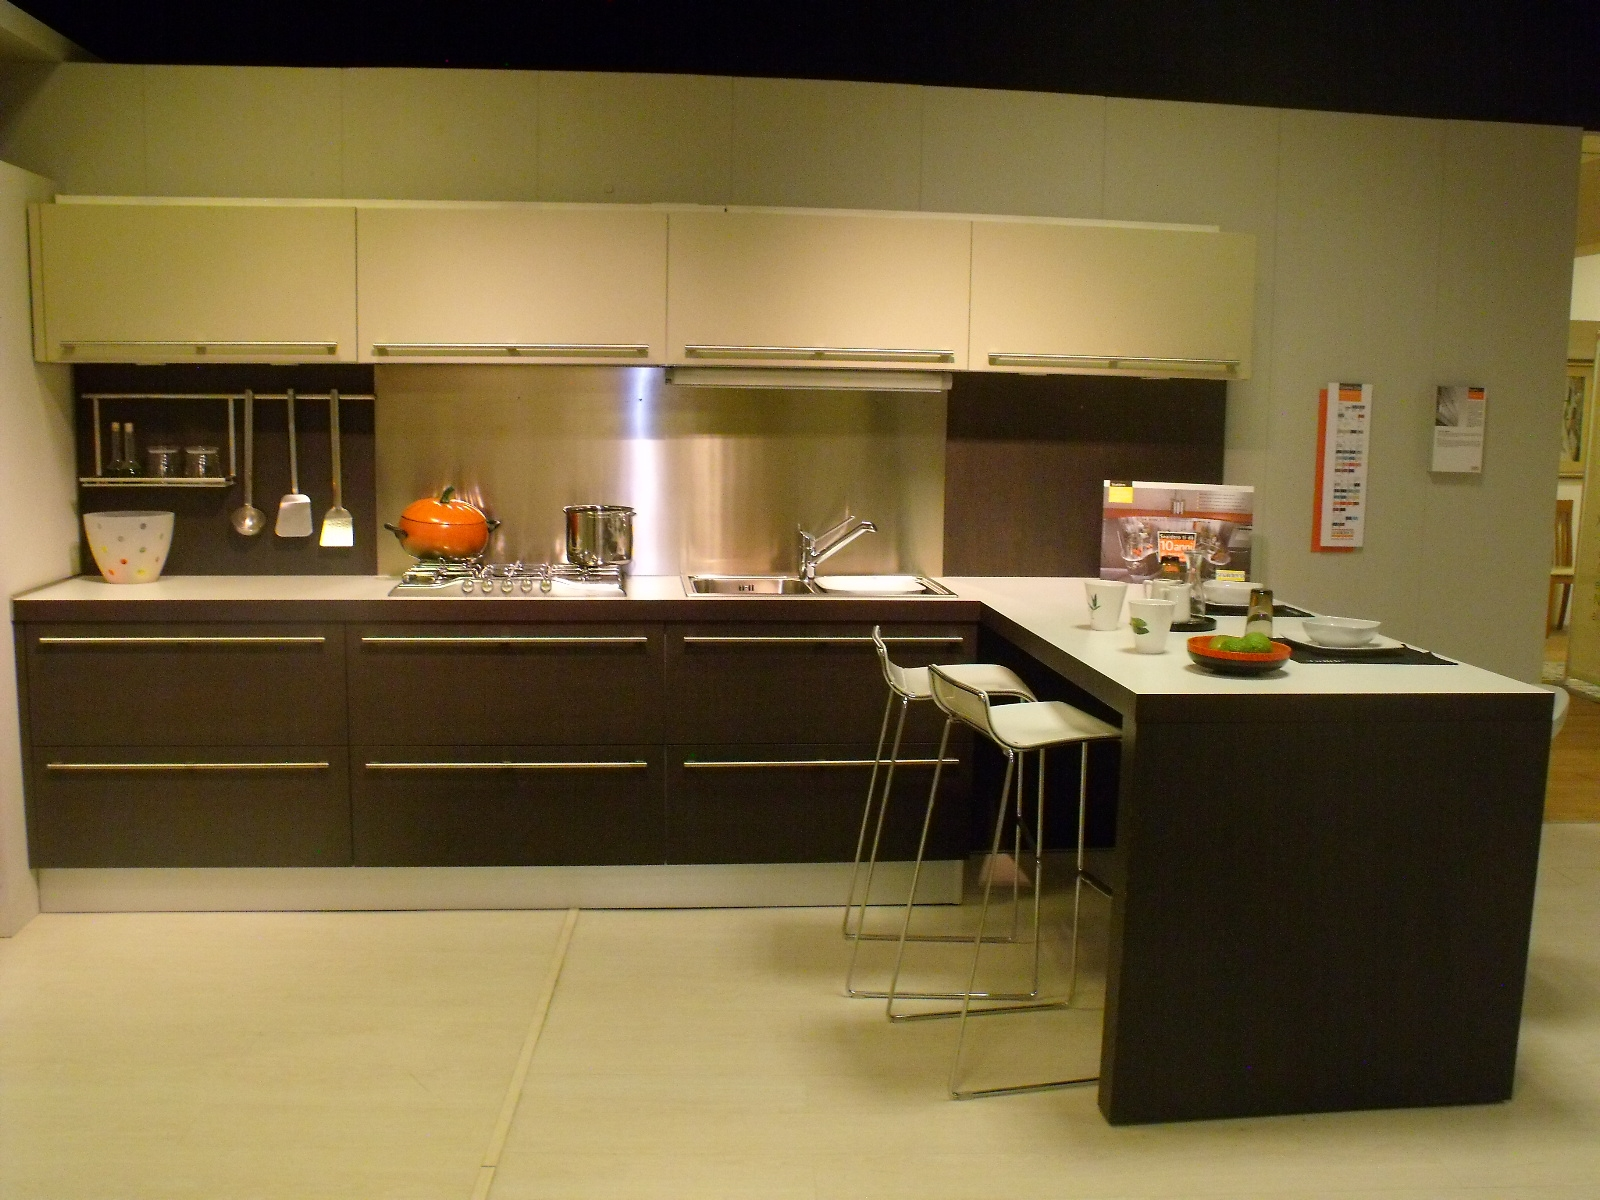 Emejing Ikea Offerte Cucine Gallery - acrylicgiftware.us ...